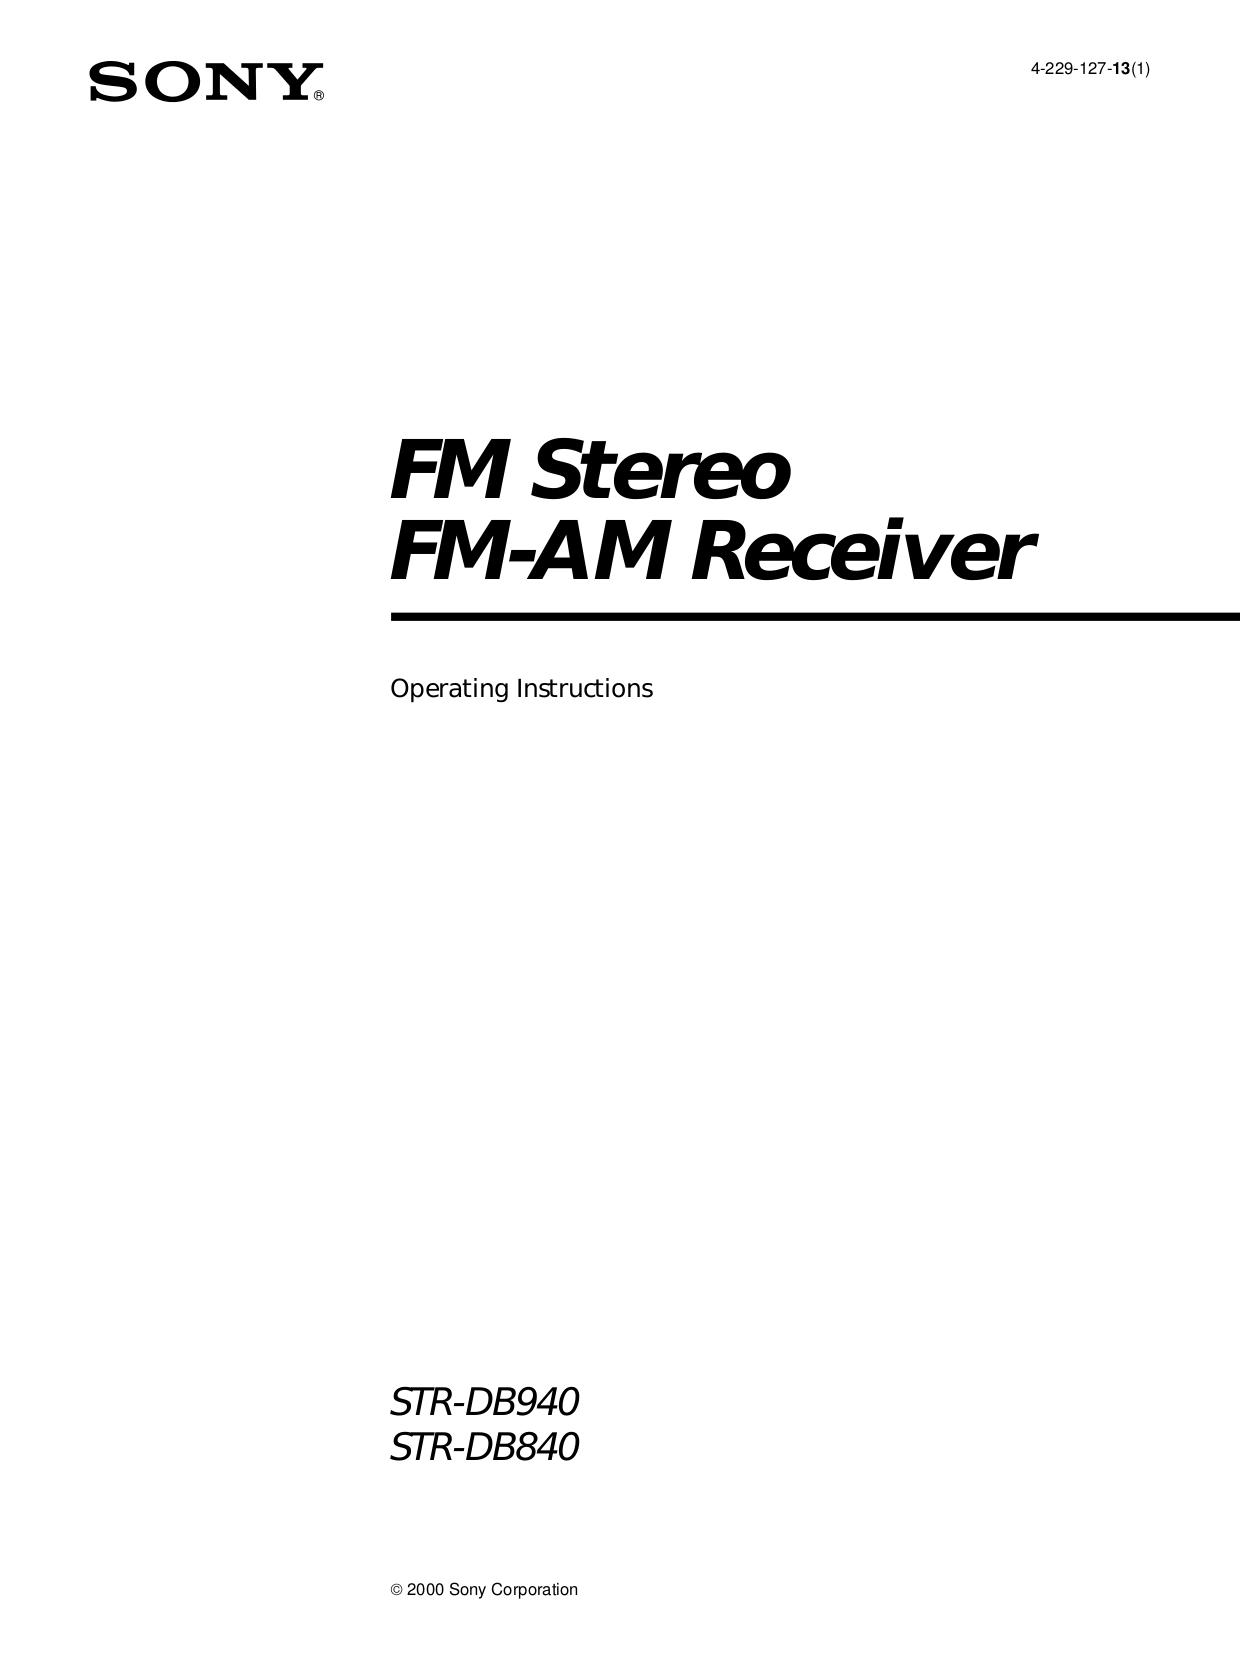 Download free pdf for Sony STR-DB940 Receiver manual